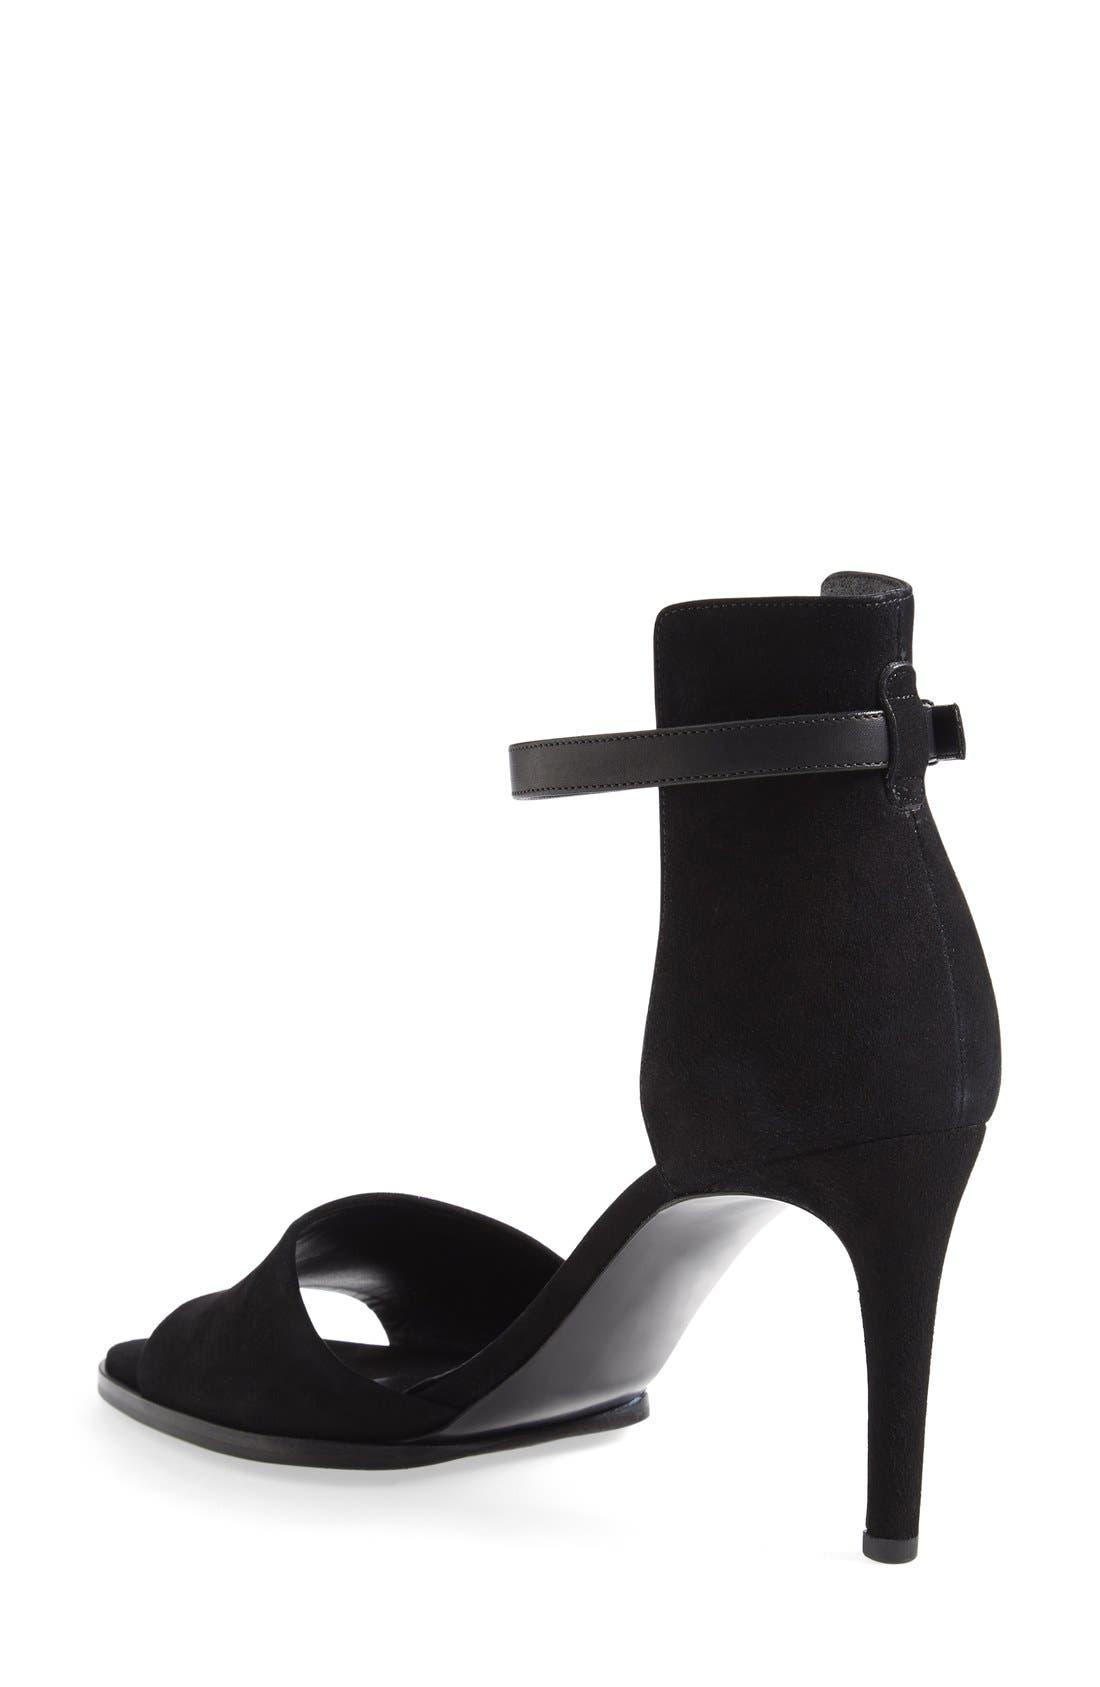 Alternate Image 2  - Vince 'Adley' Sandal (Women) (Nordstrom Exclusive)